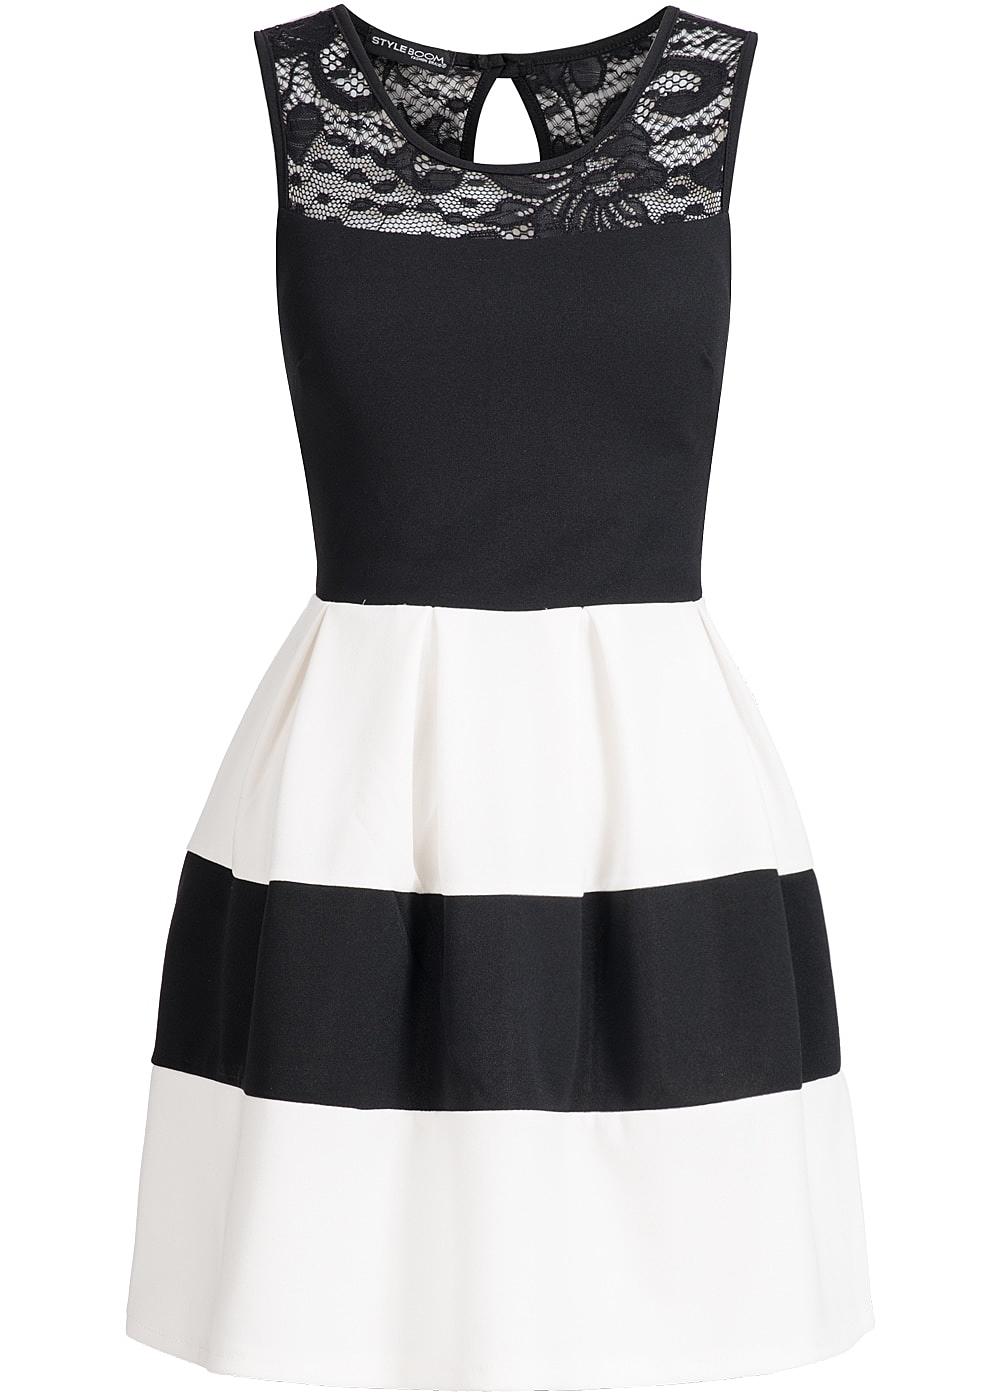 styleboom fashion damen mini kleid zipper hinten brustpads spitze gestreift schwarz weiss. Black Bedroom Furniture Sets. Home Design Ideas